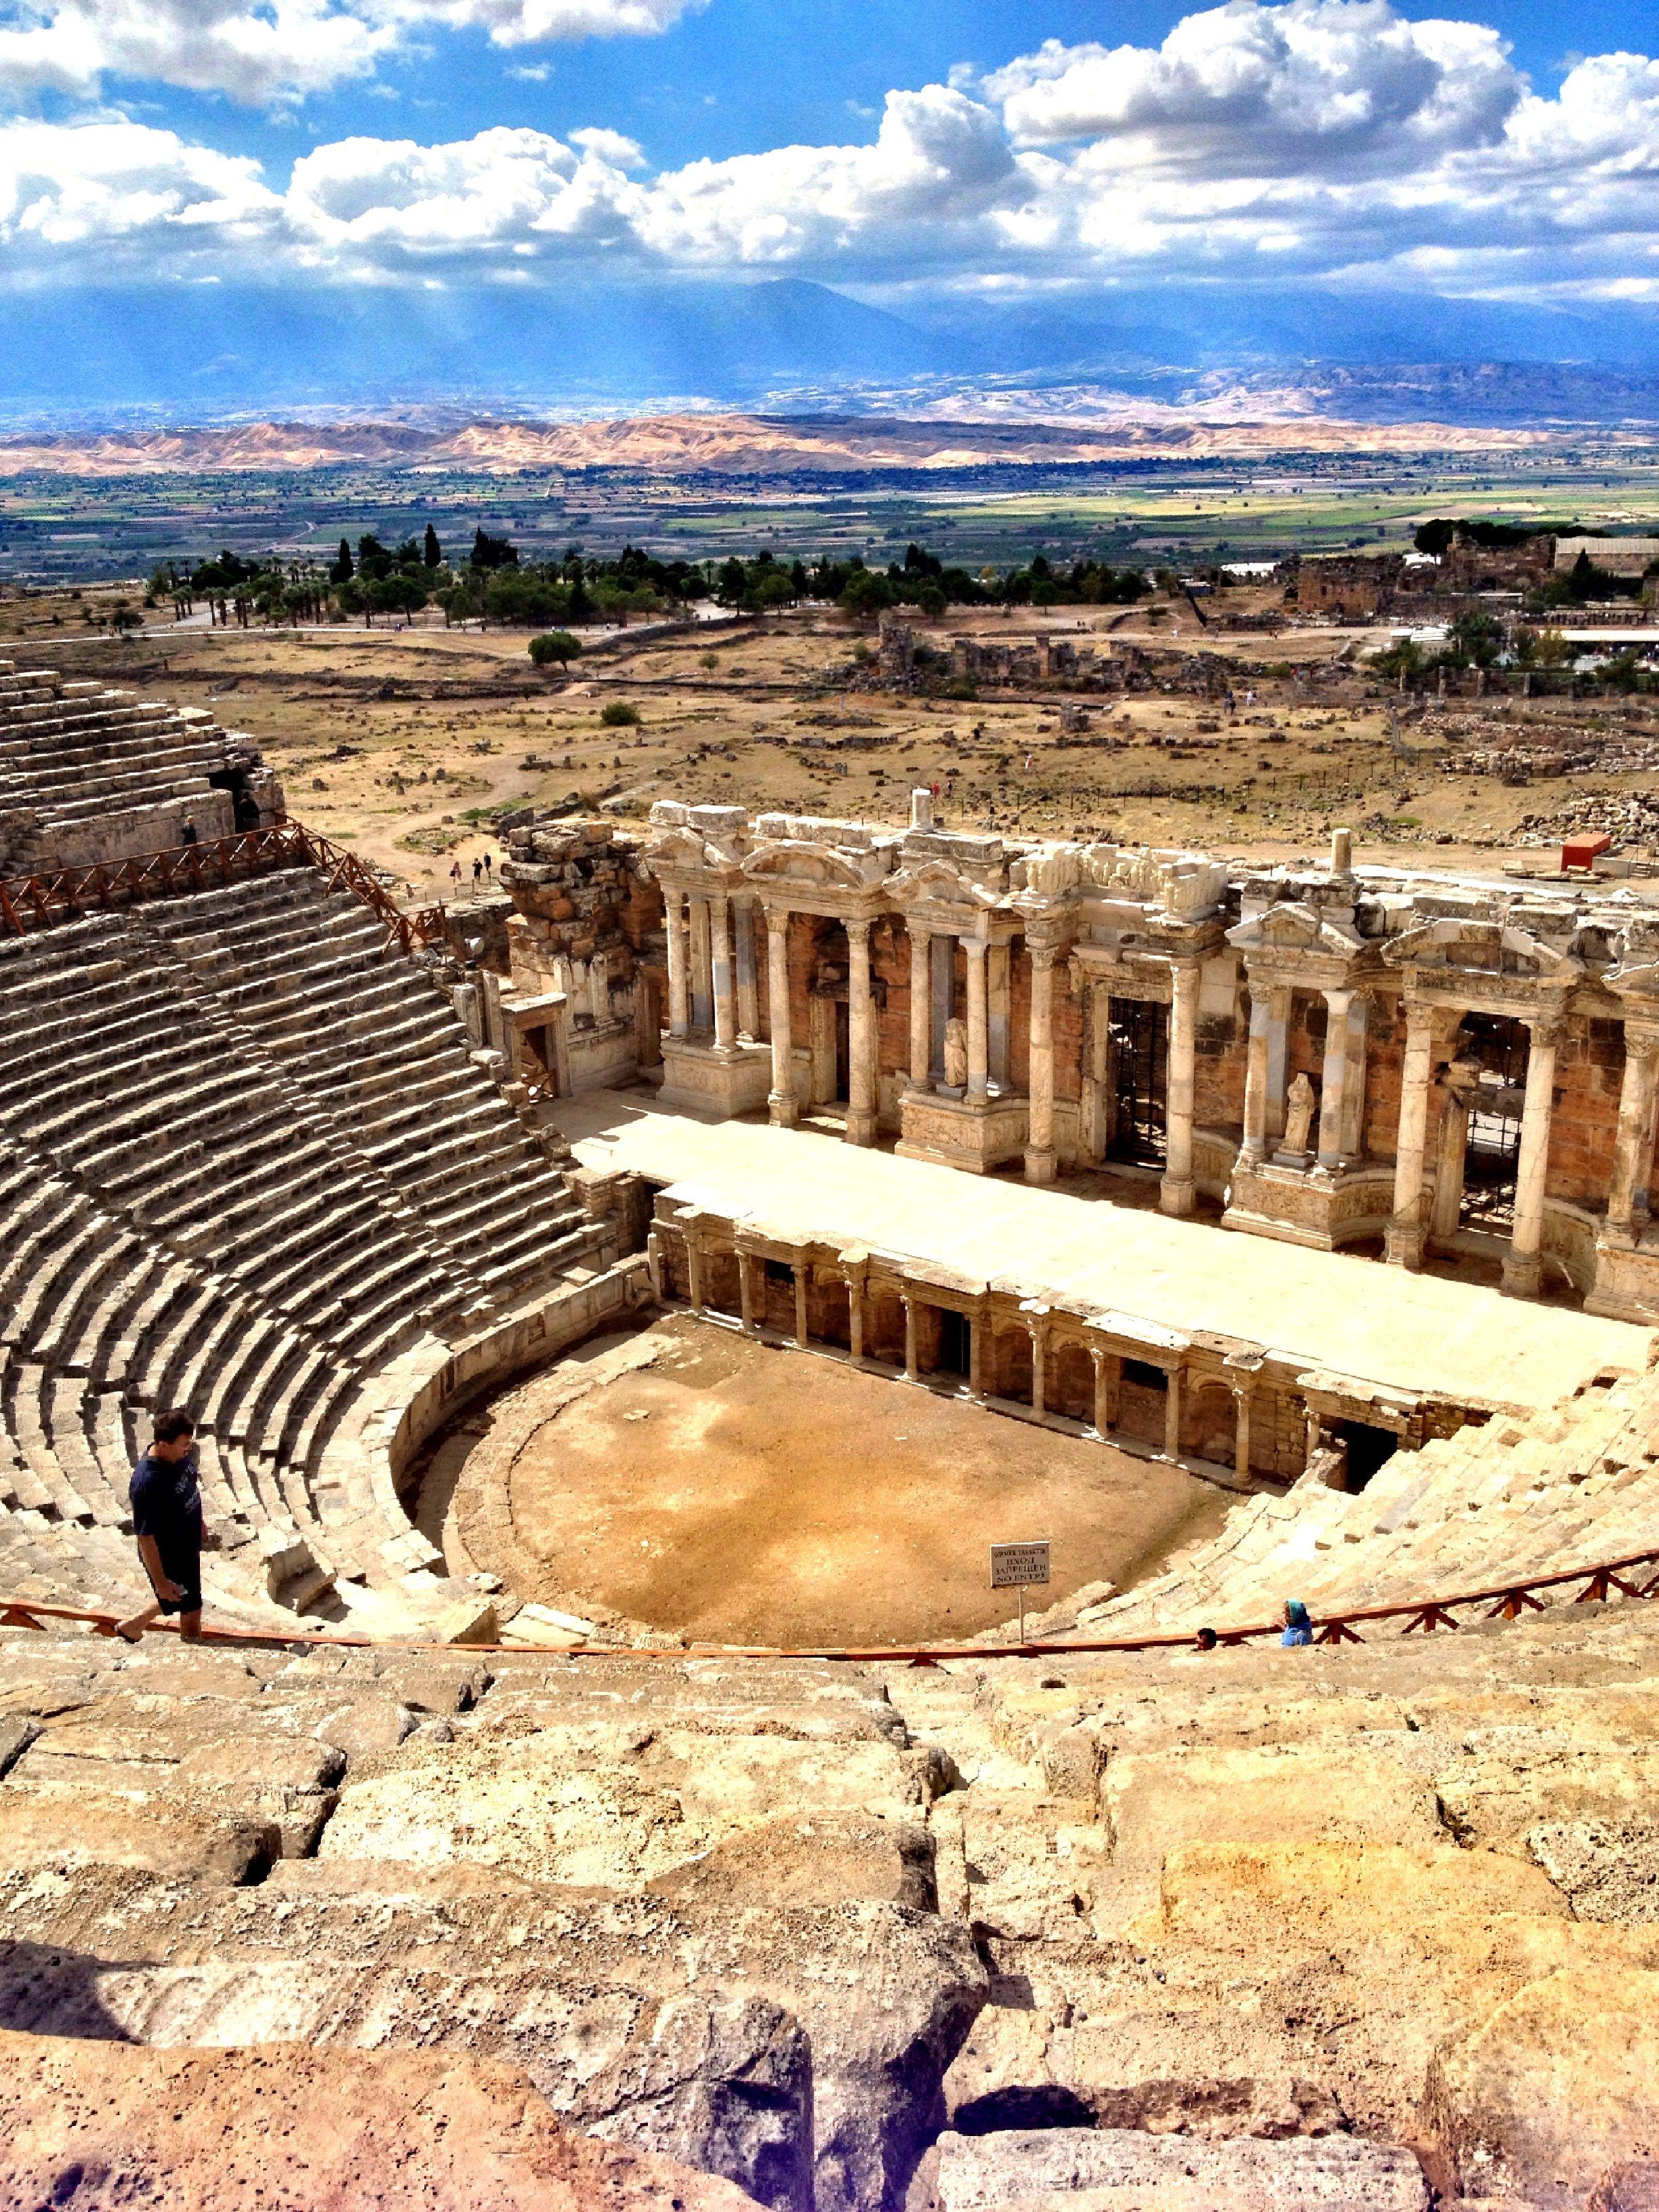 Ruins of an ancient Roman theatre, Hierapolis, Turkey